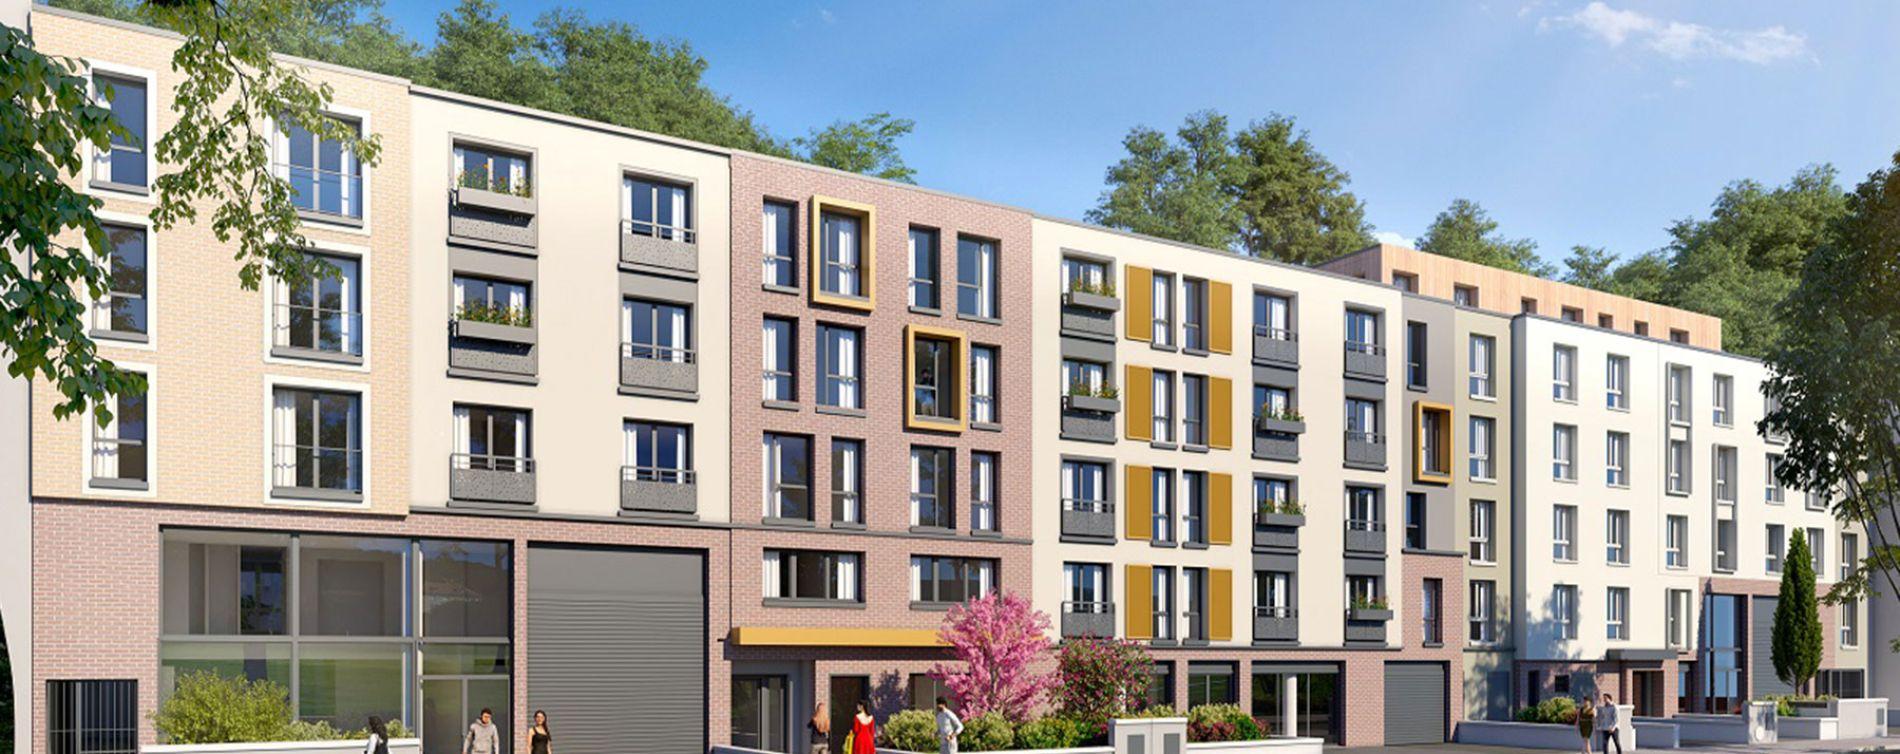 Le Port-Marly programme immobilier neuve « Evolution »